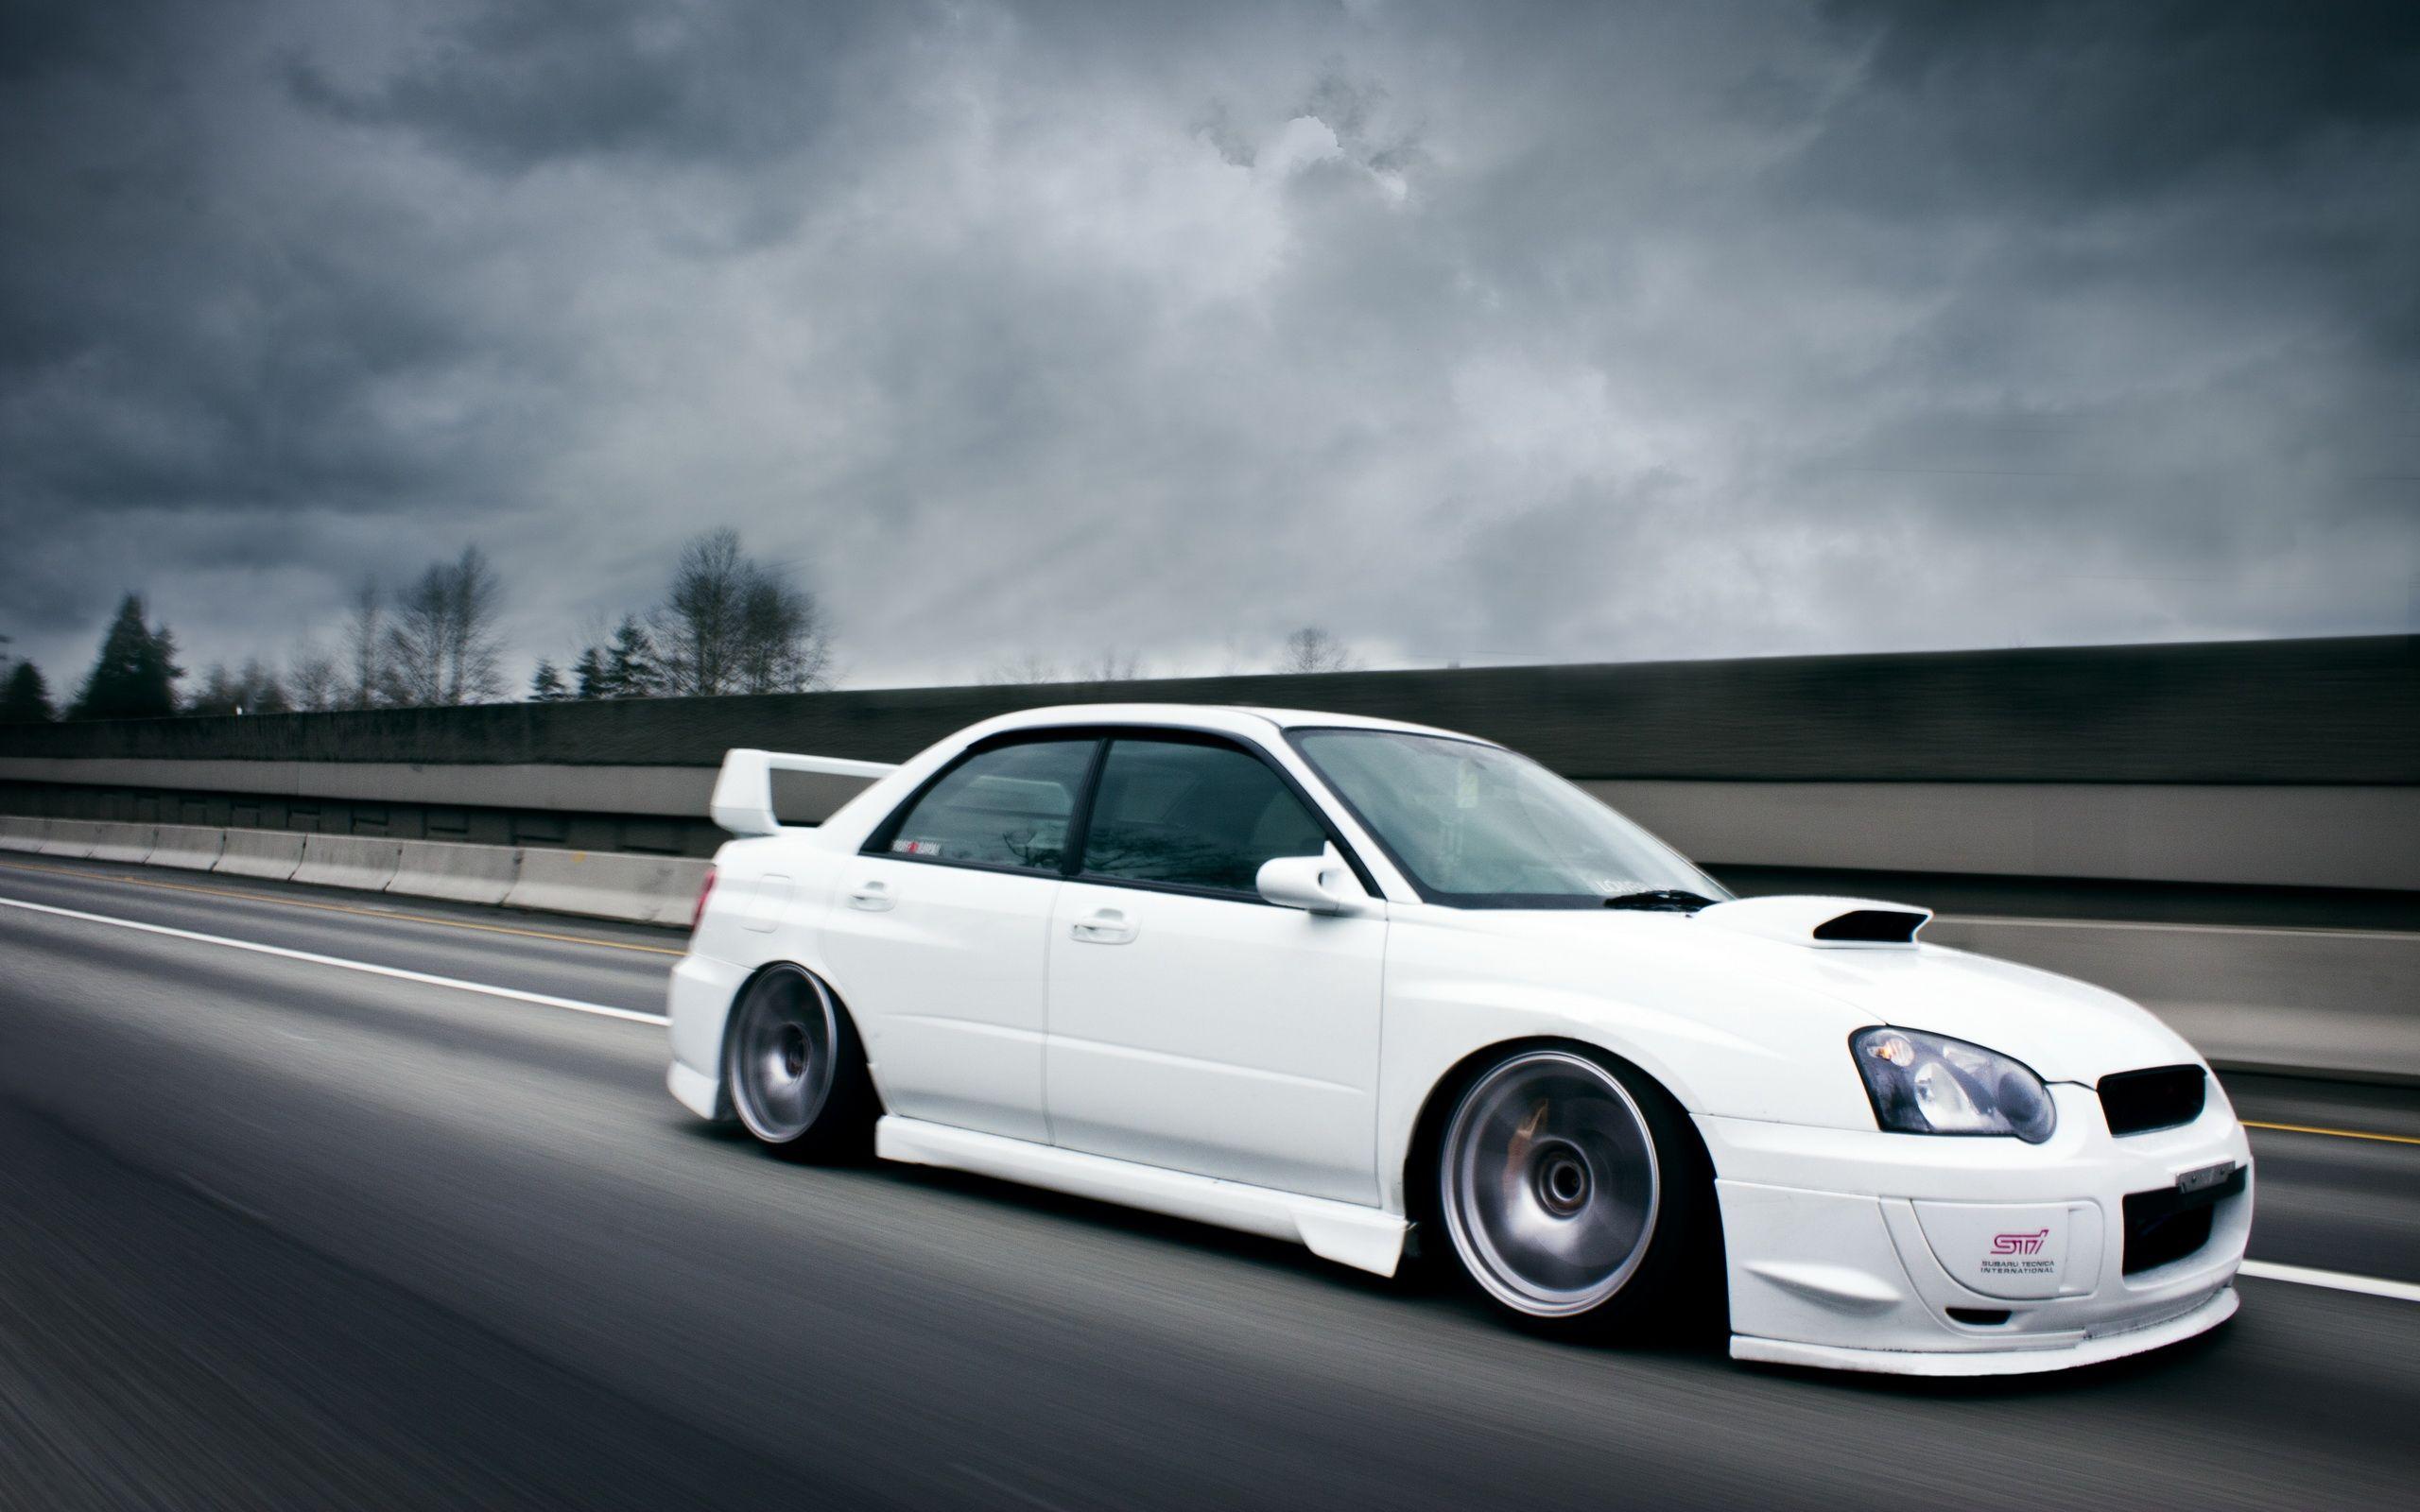 Subaru Impreza Subaru Impreza Sti White Wallpaper Hd 844 Hd